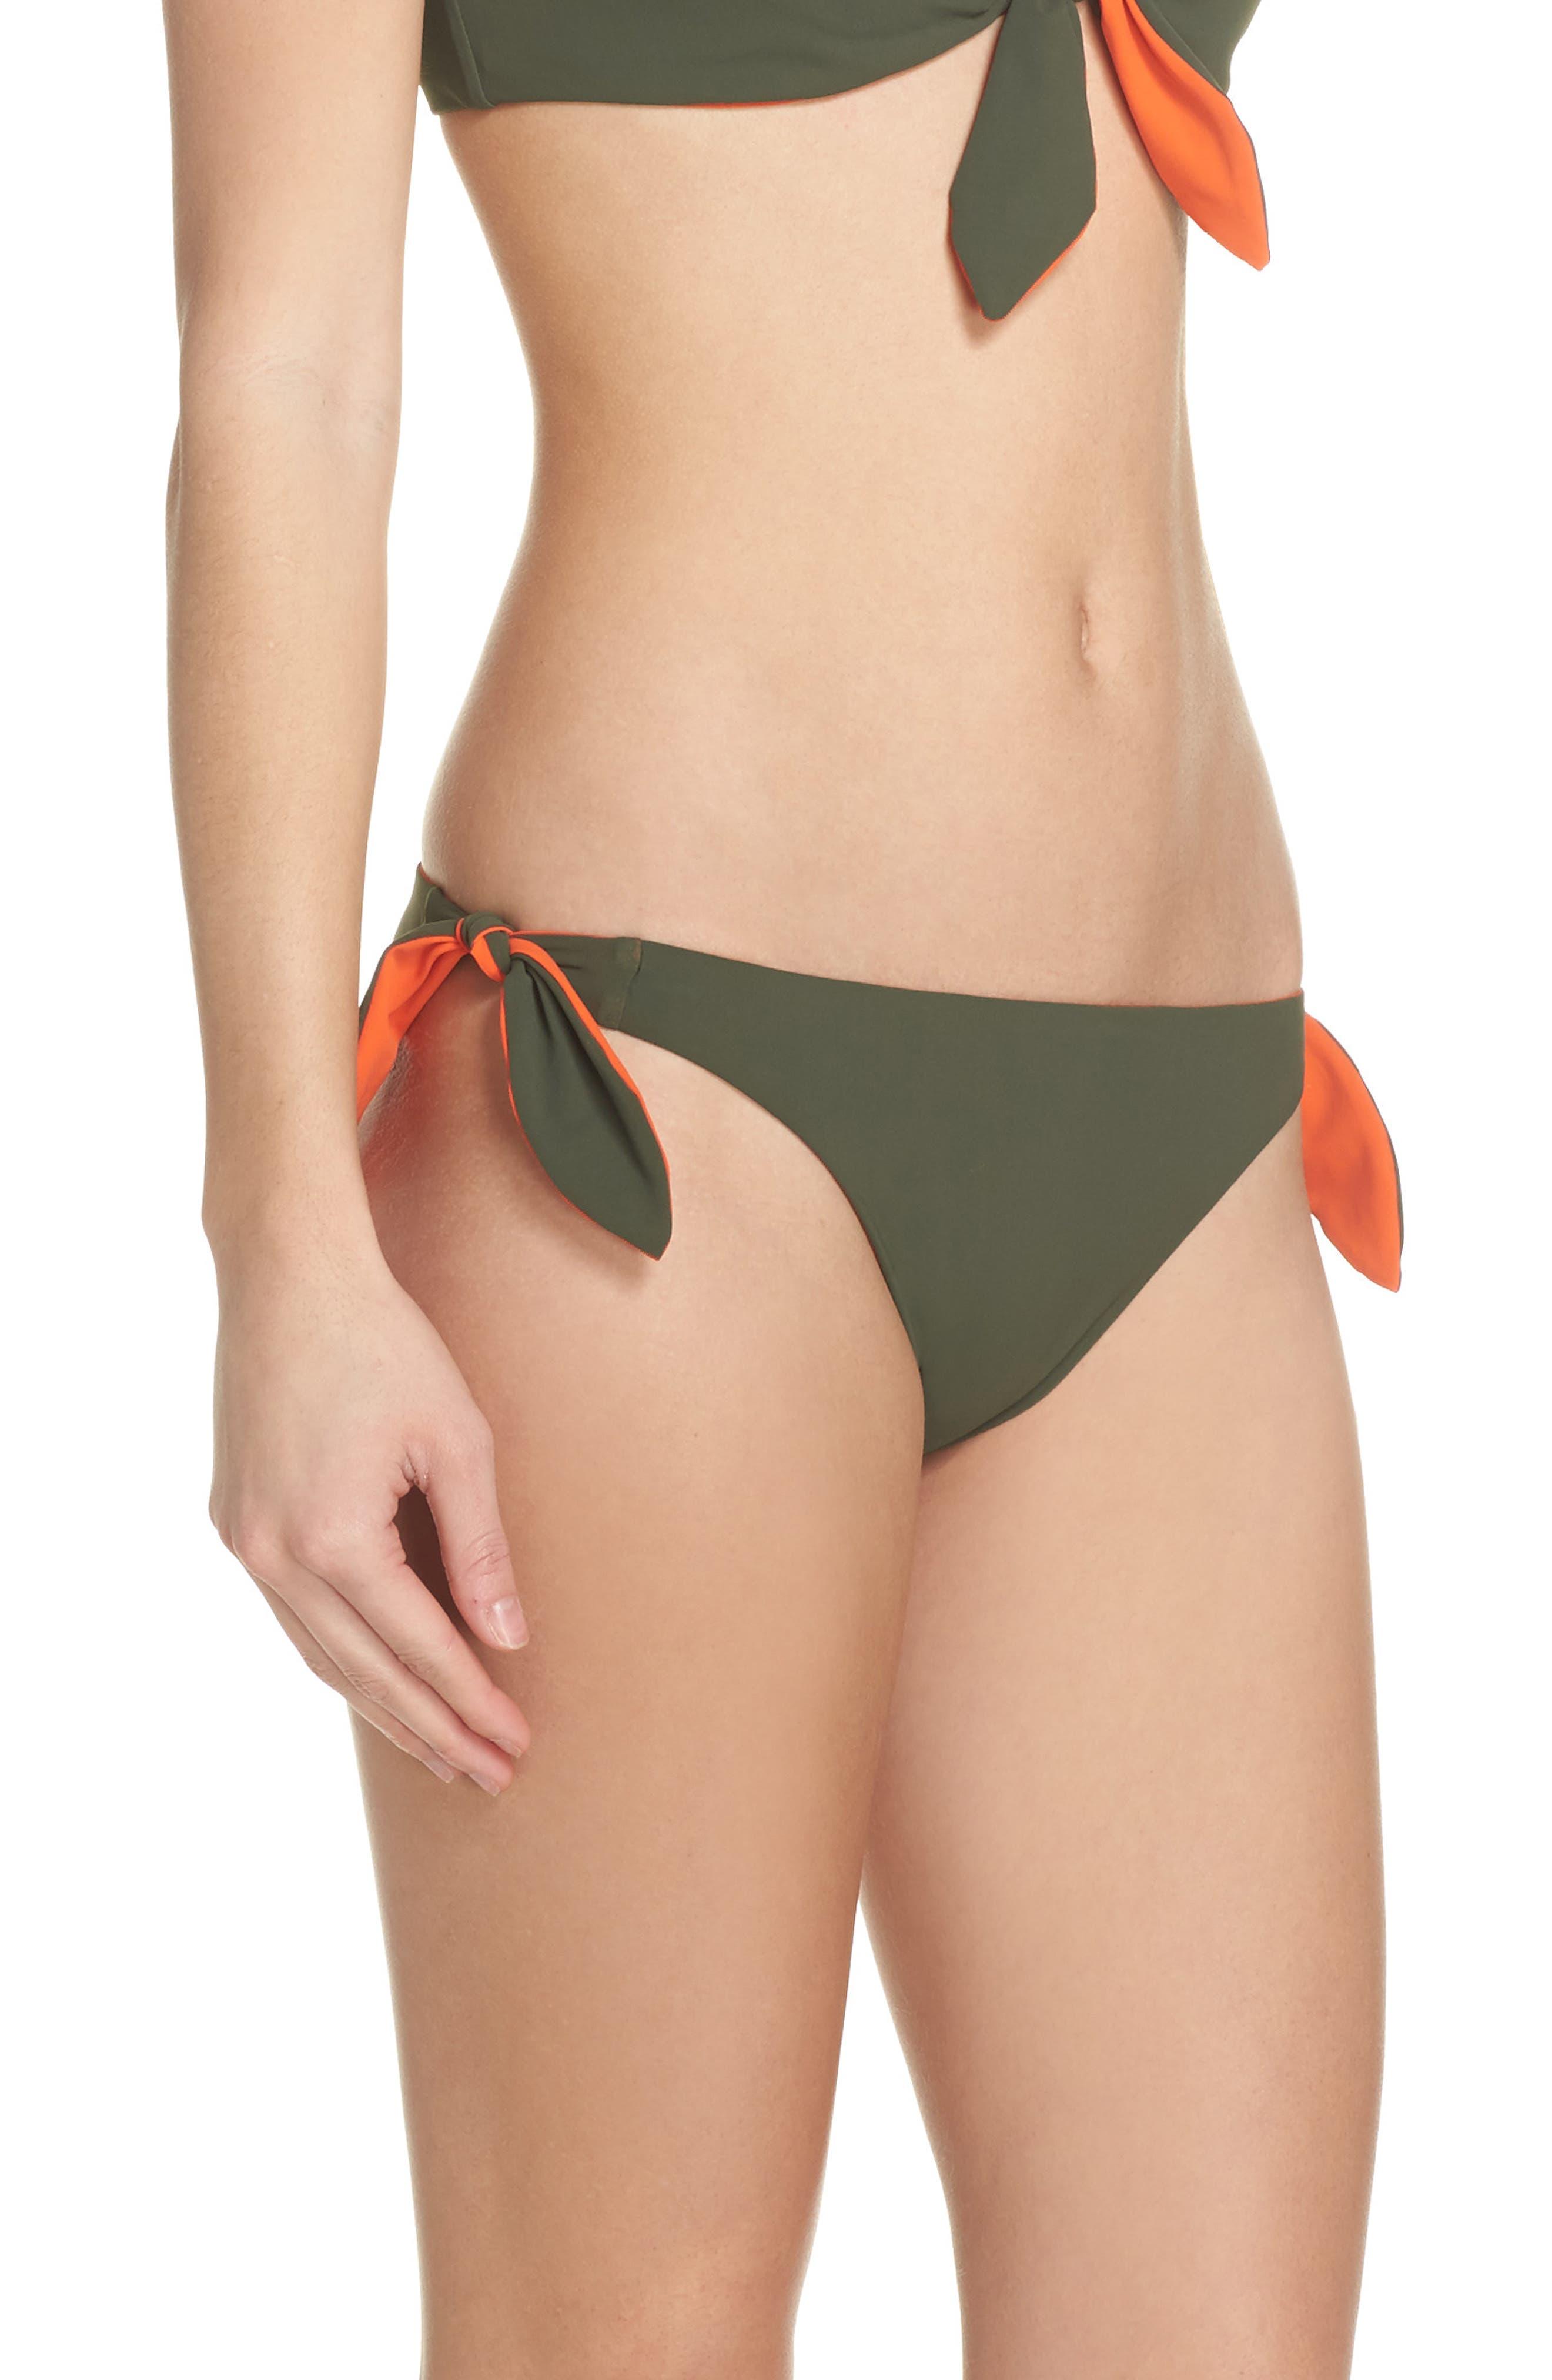 Biarritz Reversible Bikini Bottoms,                             Alternate thumbnail 4, color,                             Green Olive/ Sweet Tangerine